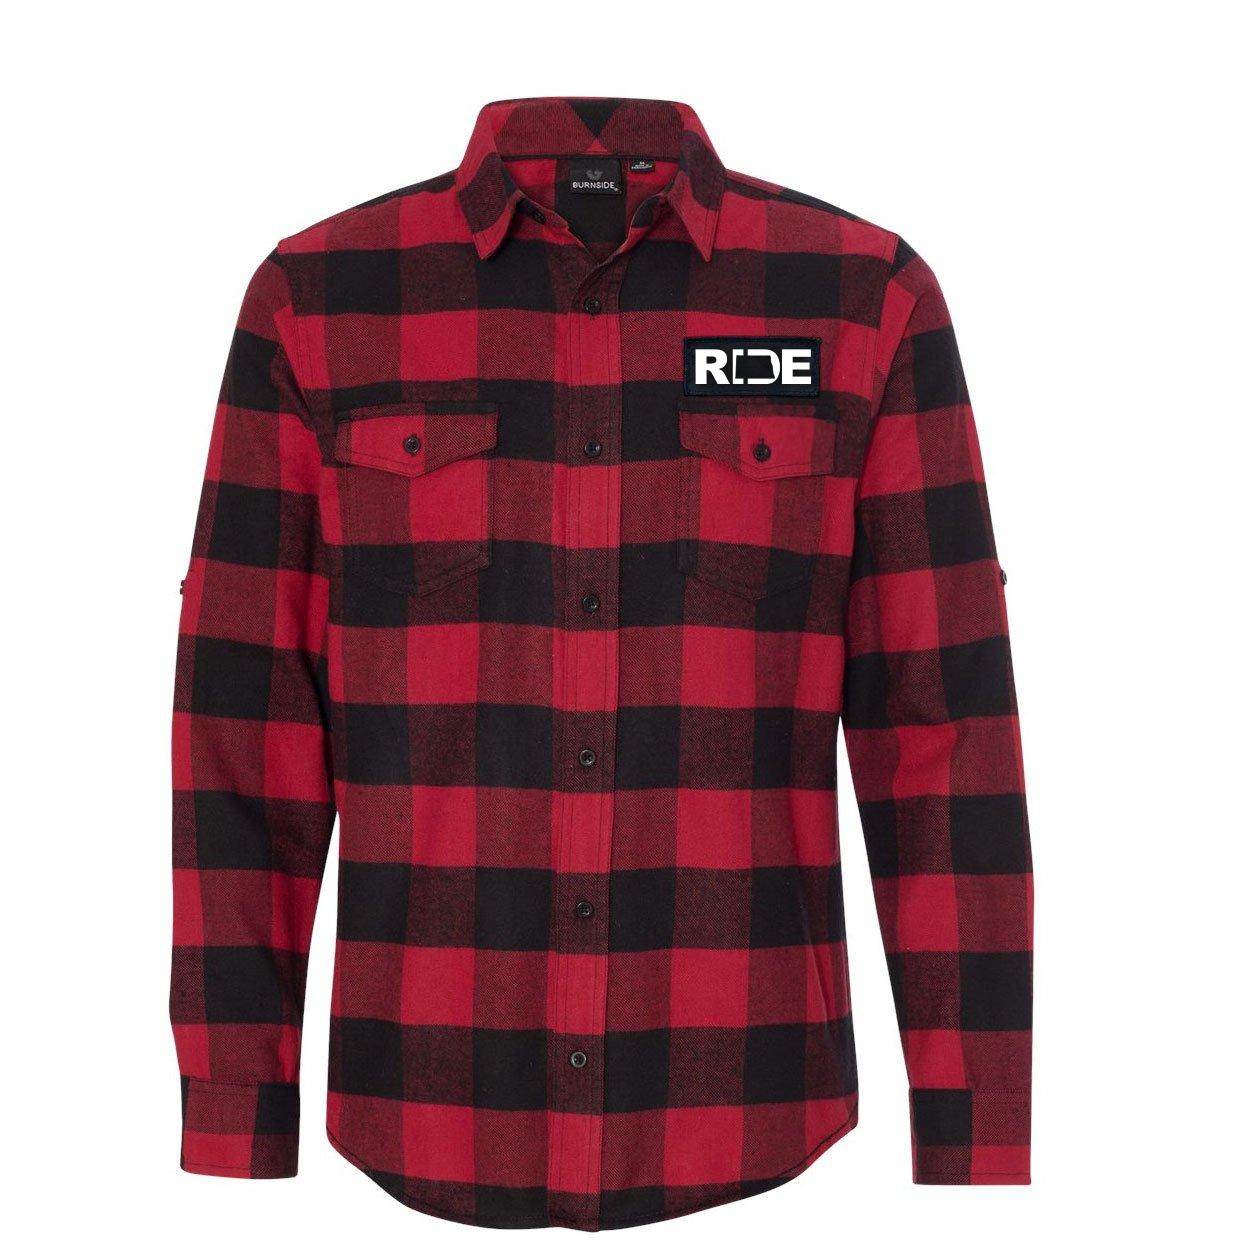 Ride North Dakota Classic Unisex Long Sleeve Woven Patch Flannel Shirt Red/Black Buffalo (White Logo)